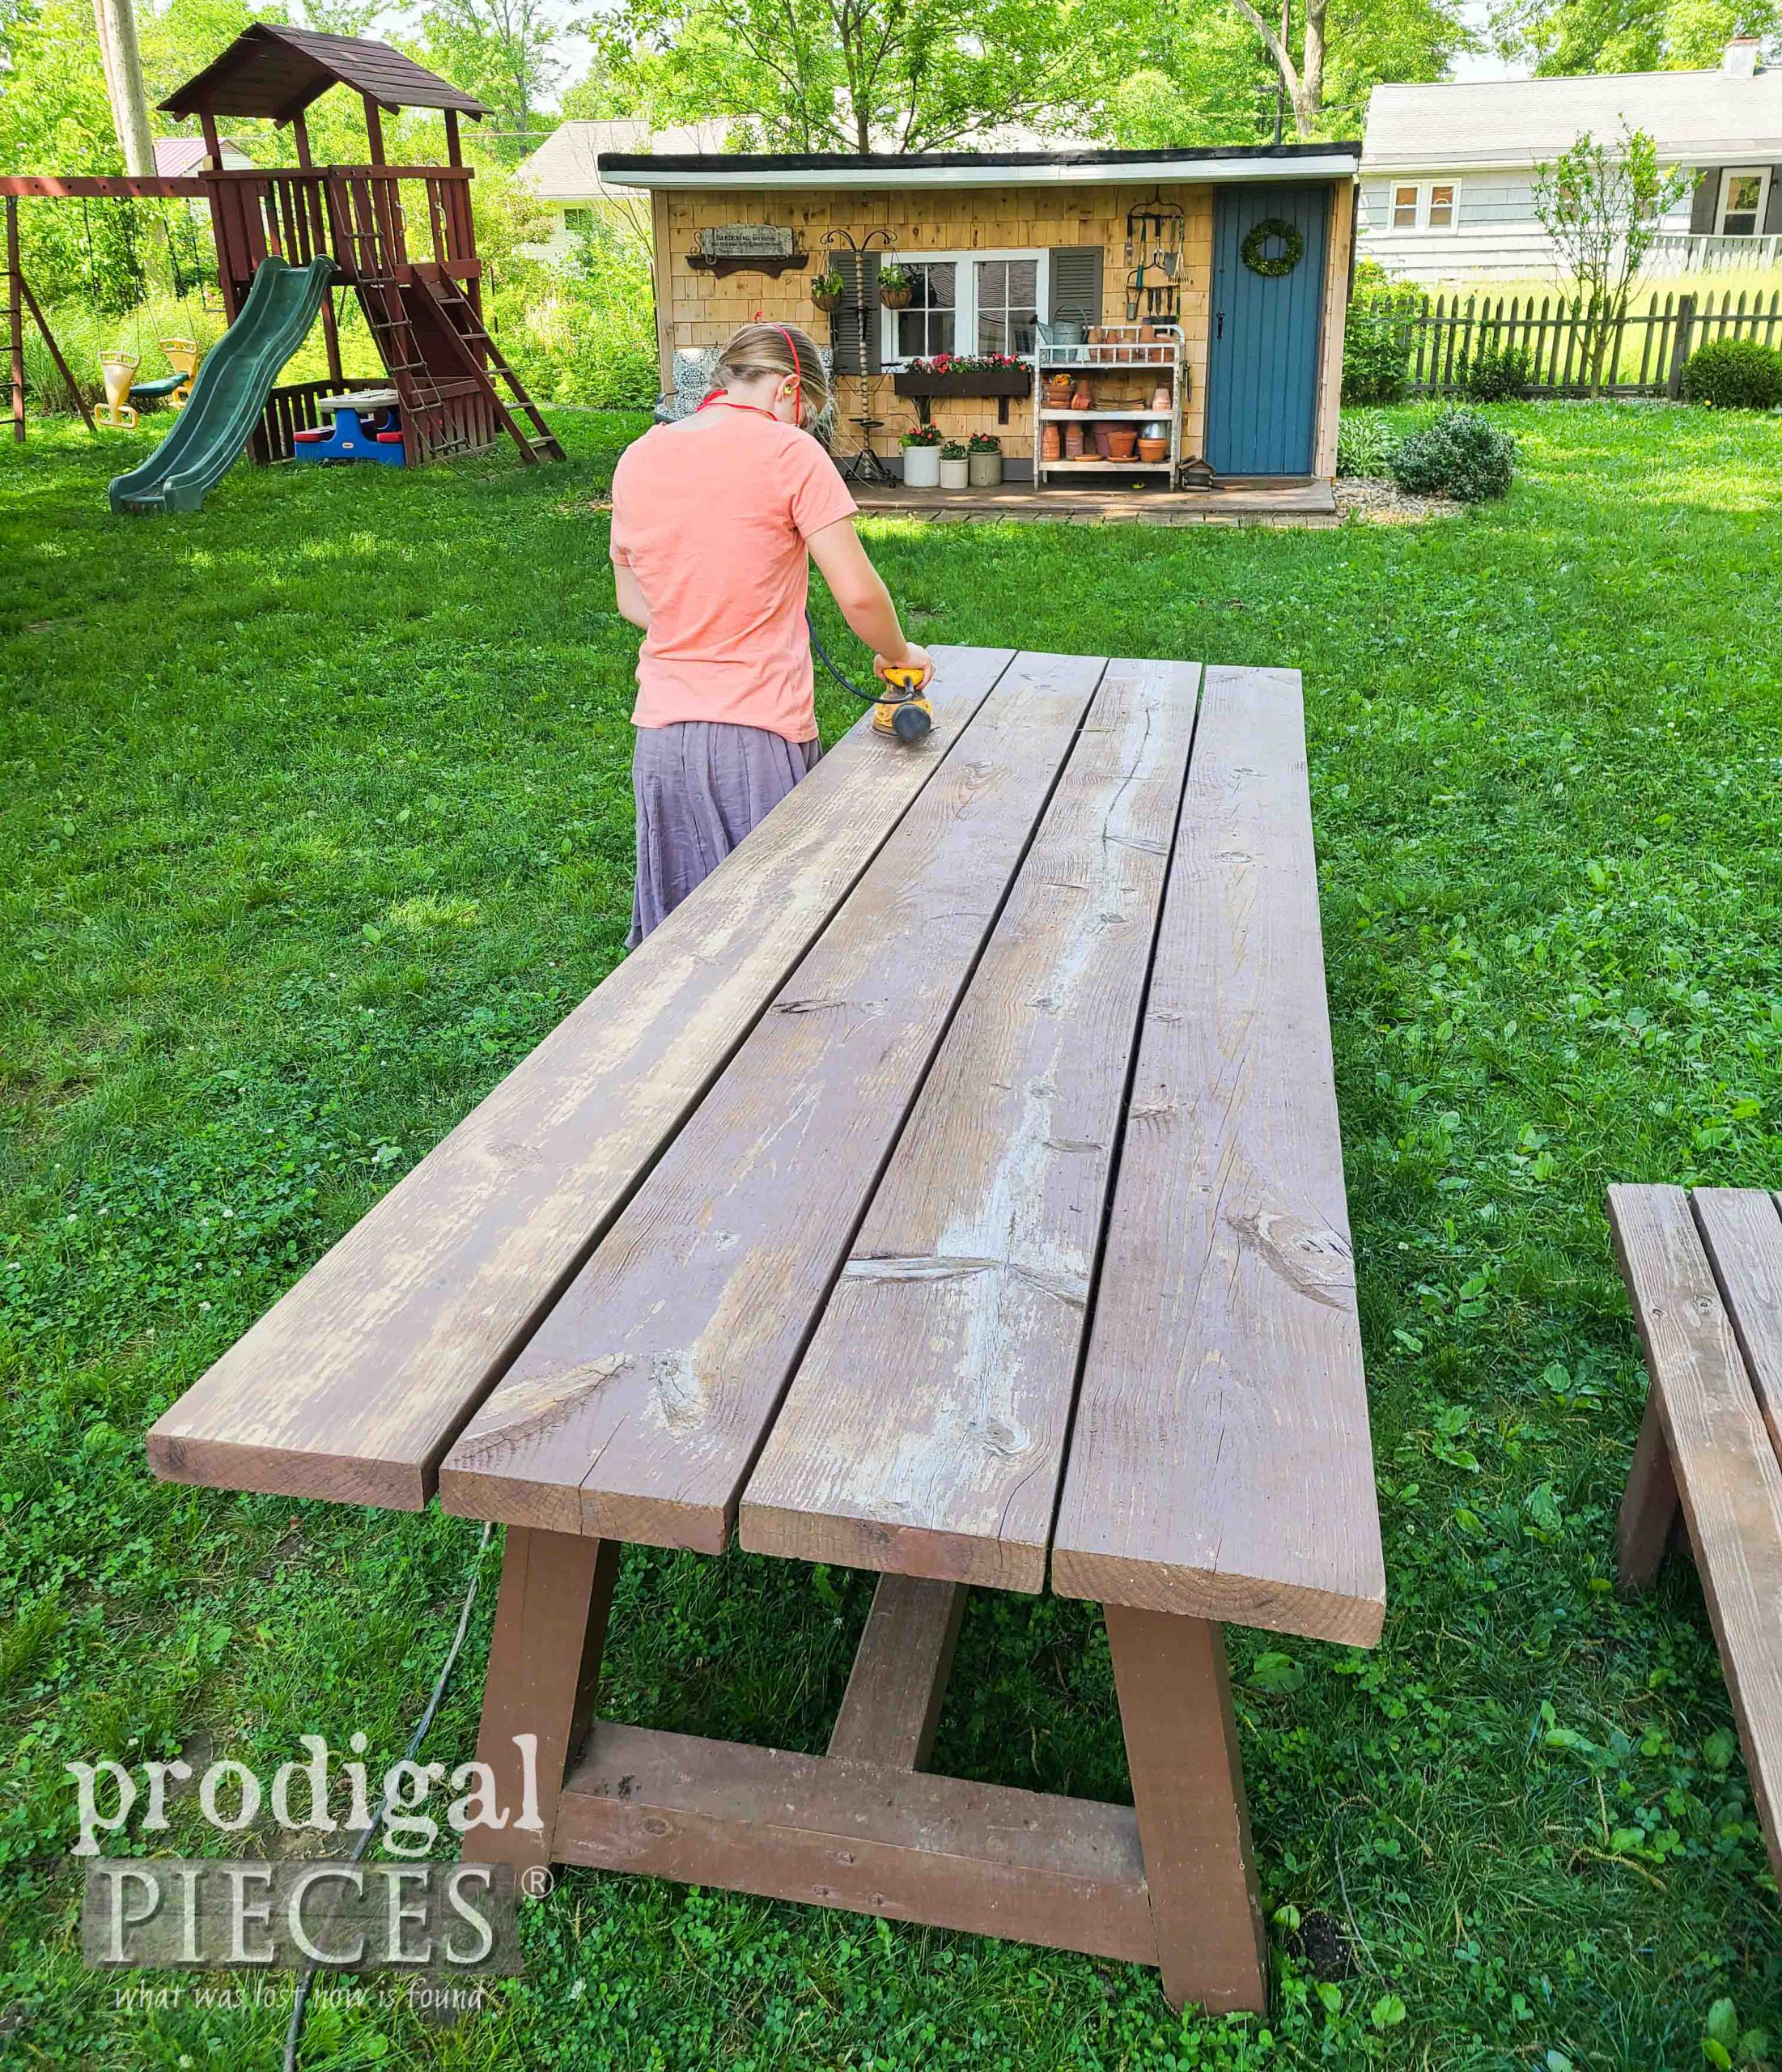 Kids Sanding Patio Table Top | prodigalpieces.com #prodigalpieces